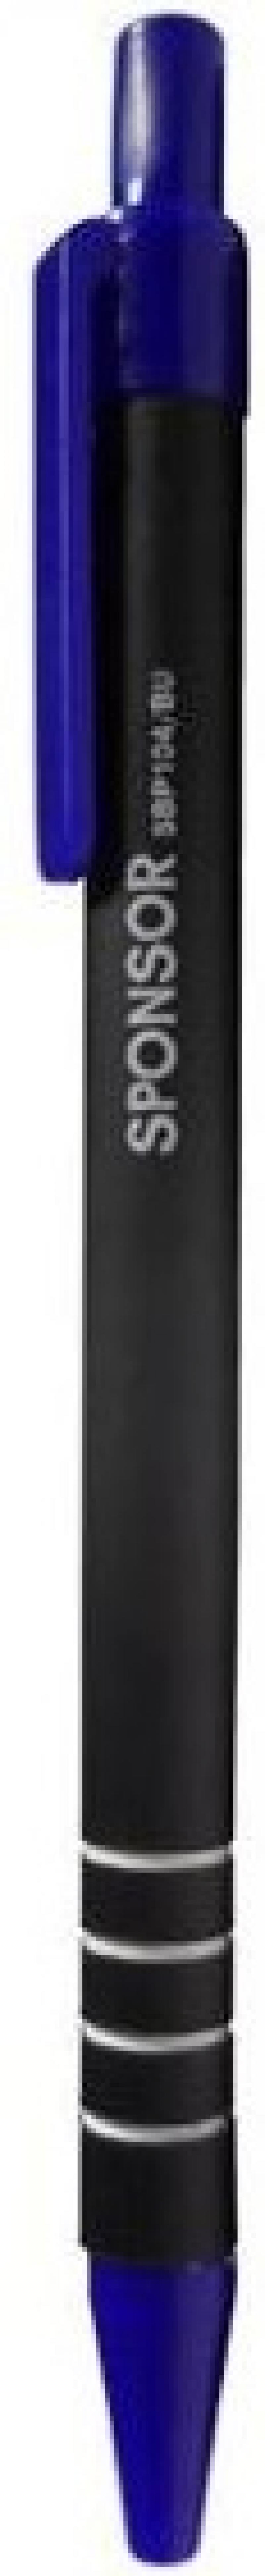 Шариковая ручка автоматическая SPONSOR SBP104/BU синий 0.7 мм SBP104/BU metal stereo earphones super bass headphone with microphone